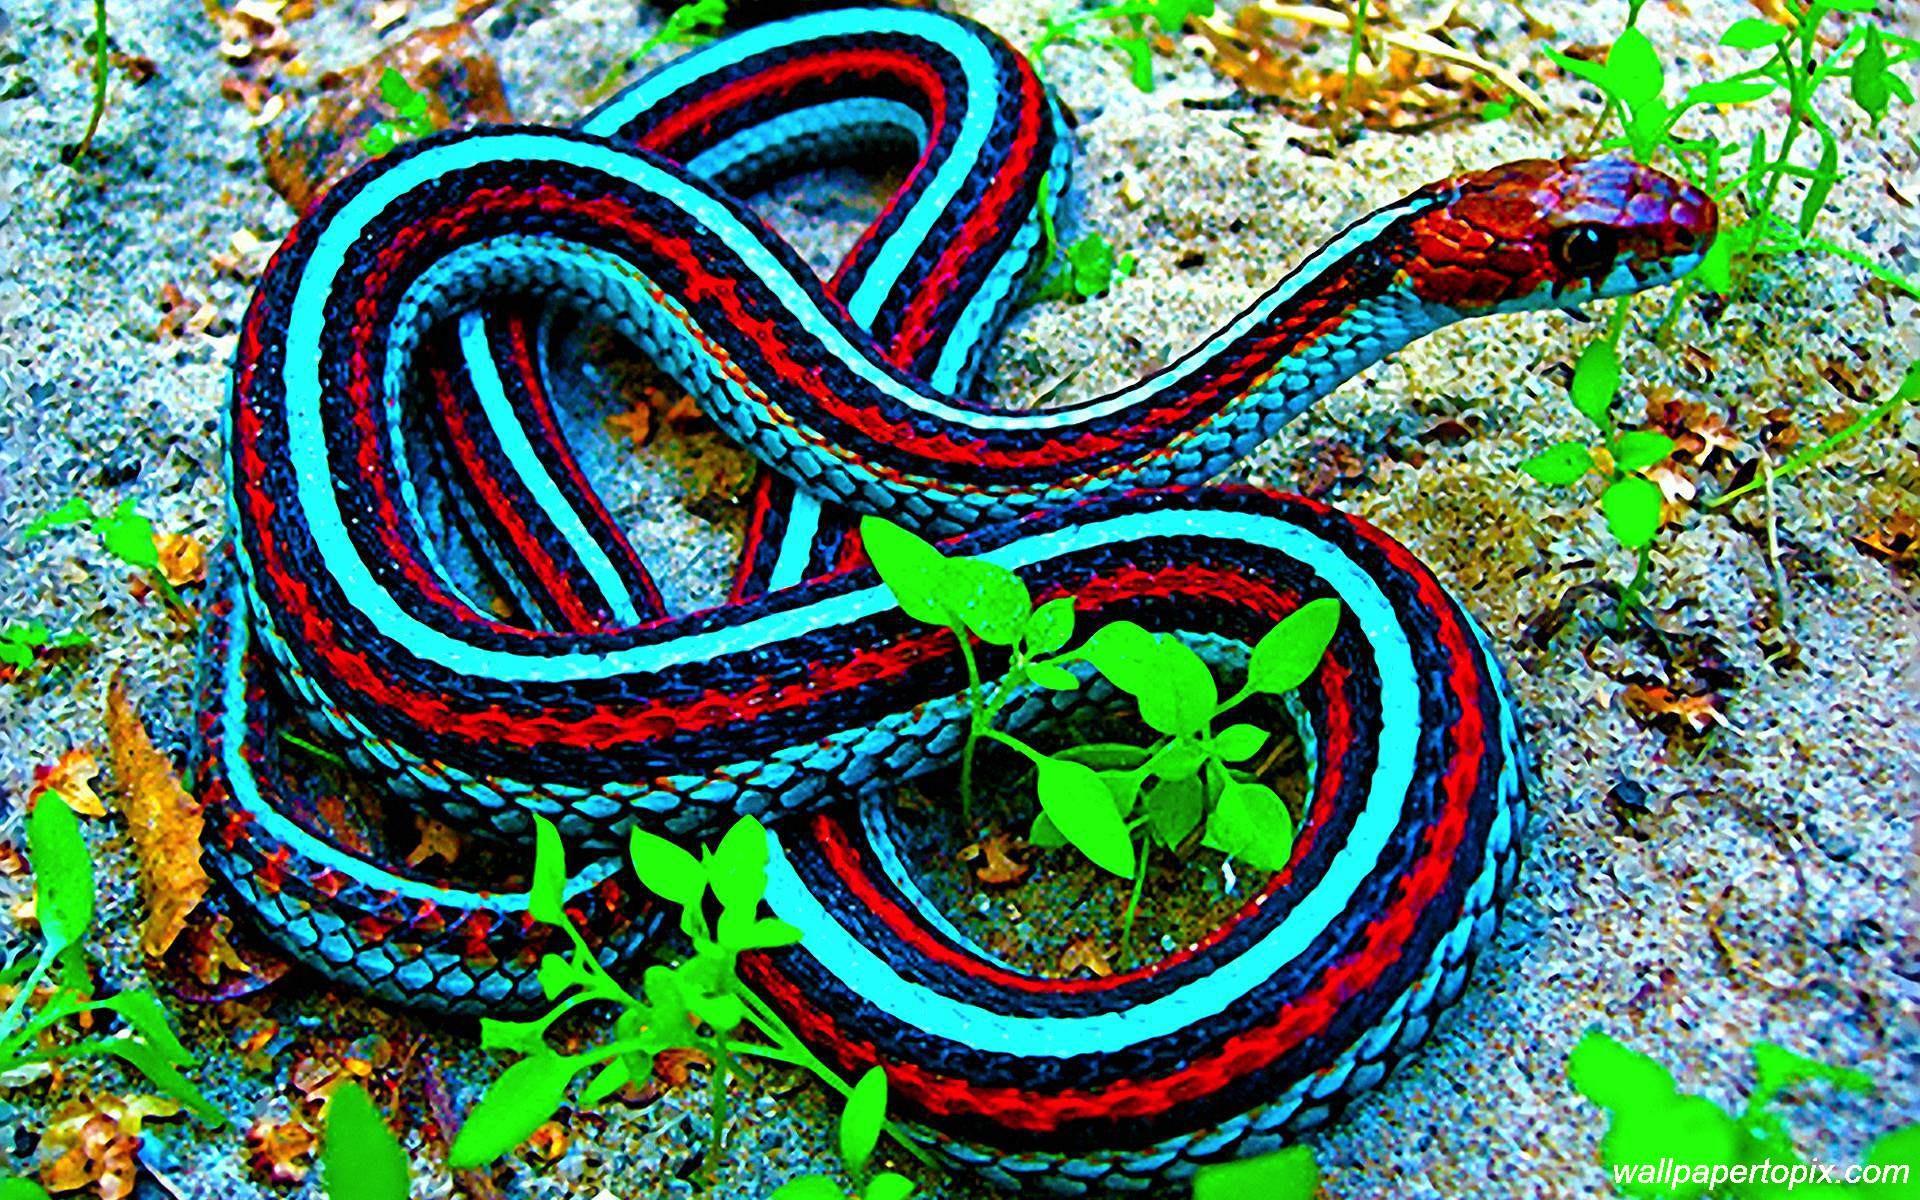 King Cobra Snake Photos: Indian King Cobra Snake Wallpaper (50+ Images